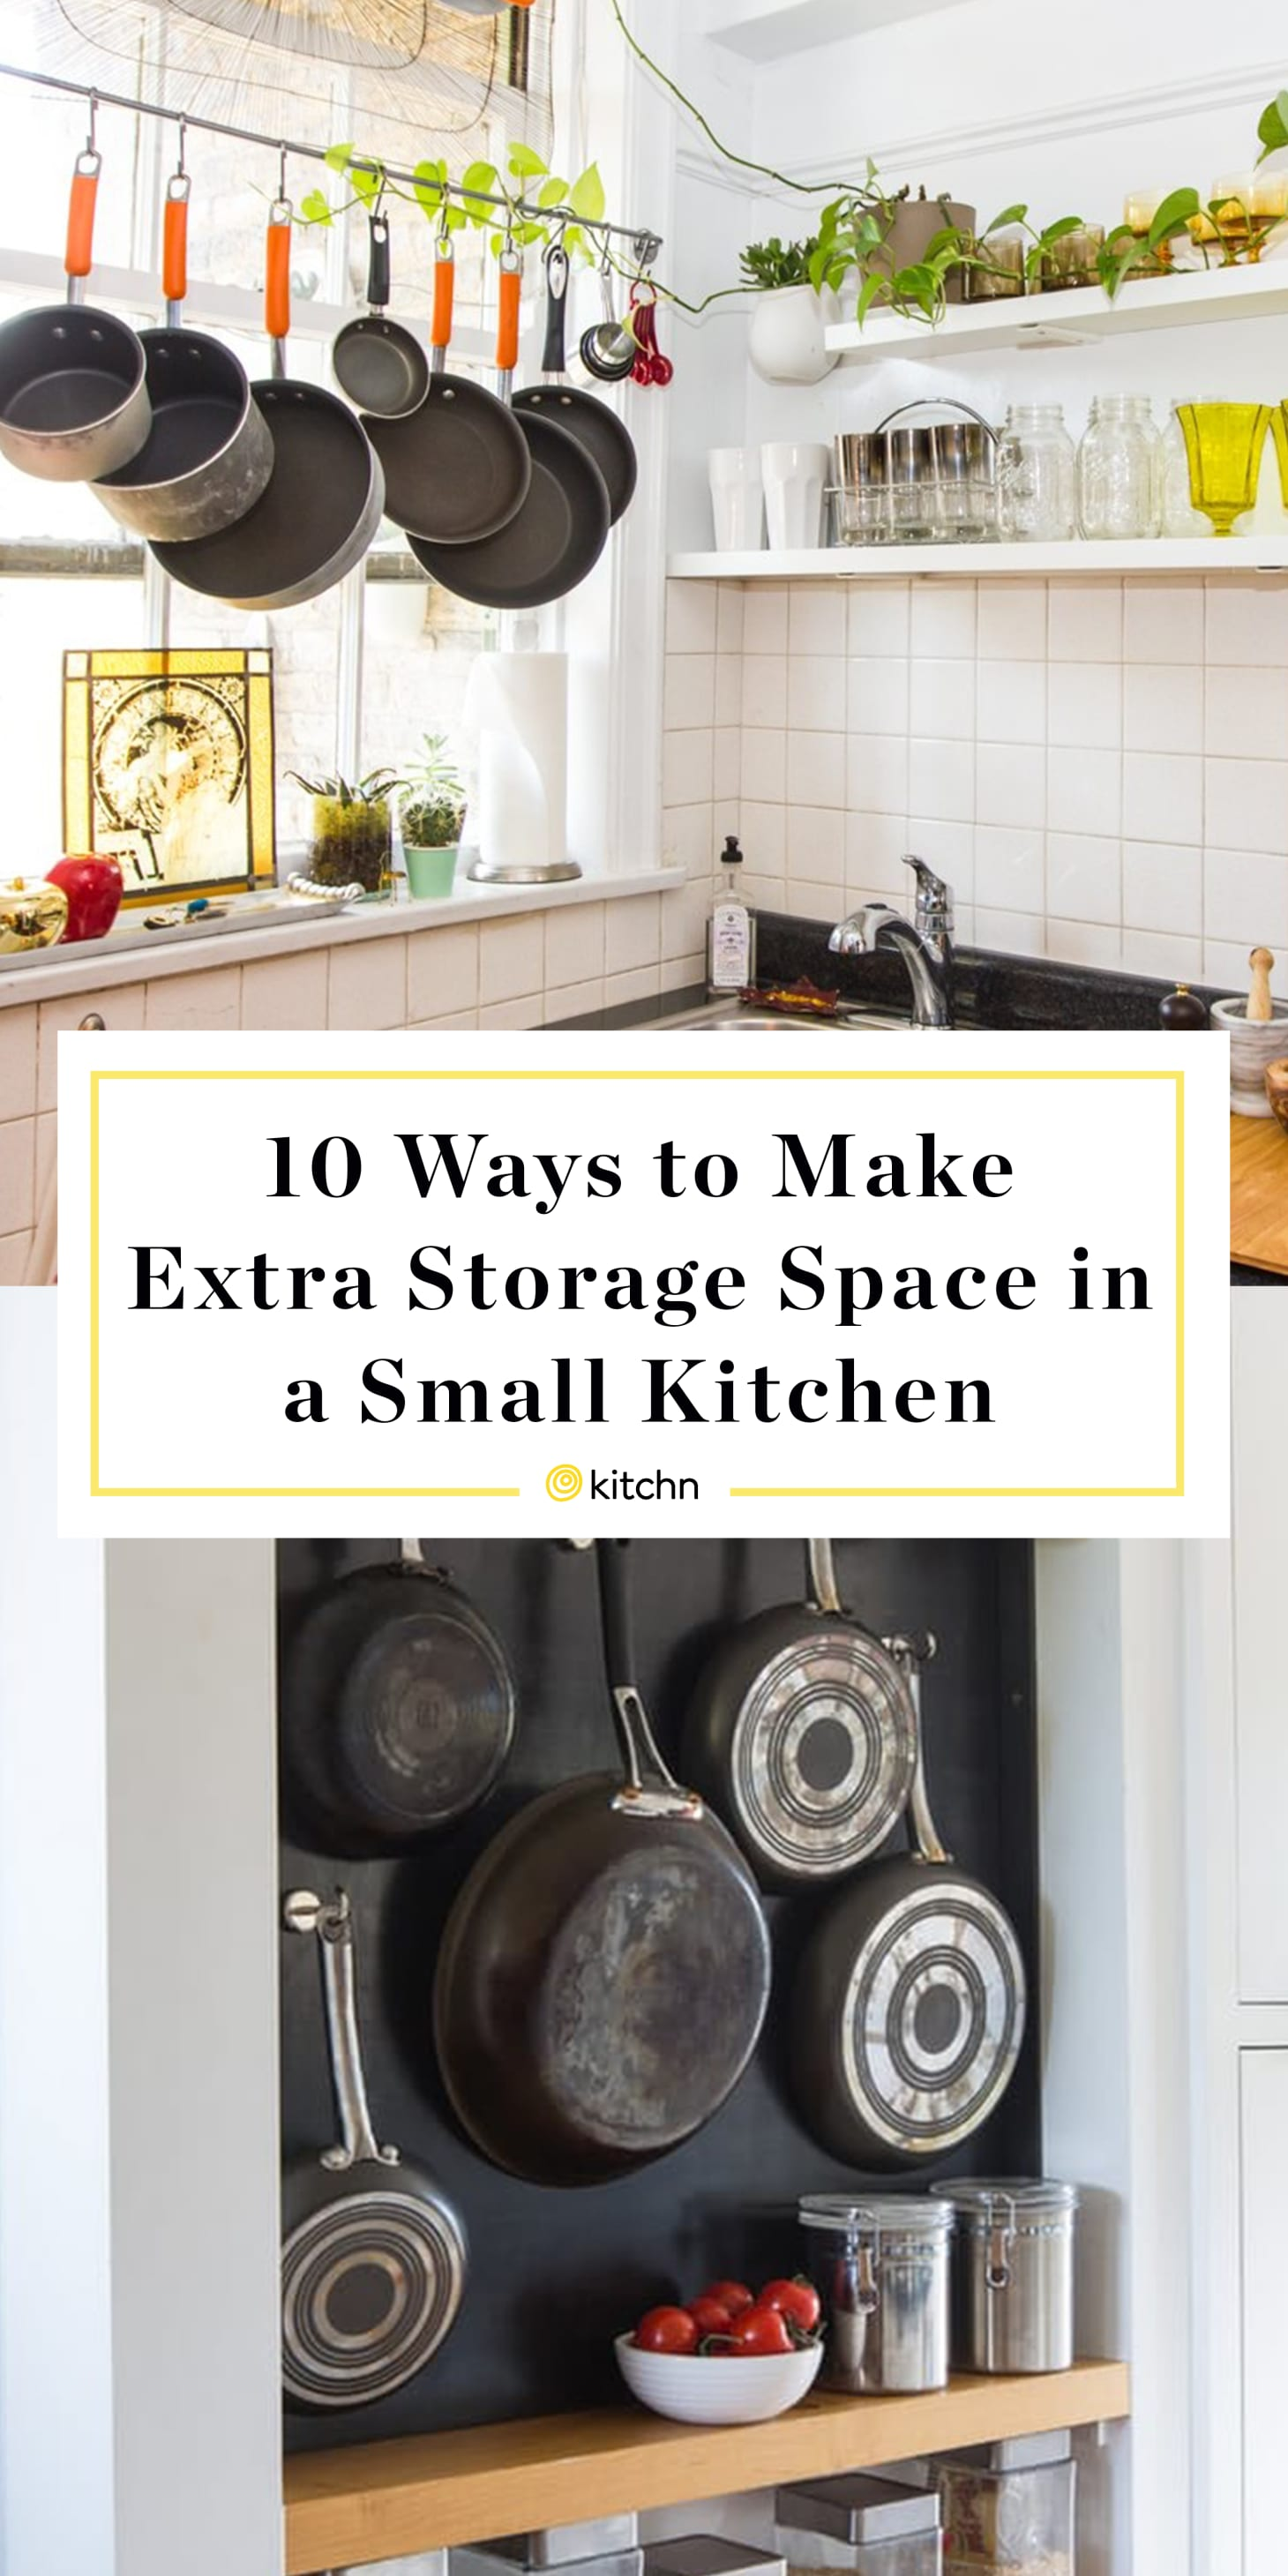 Storage Ideas for Small Kitchens | Kitchn - photo#34